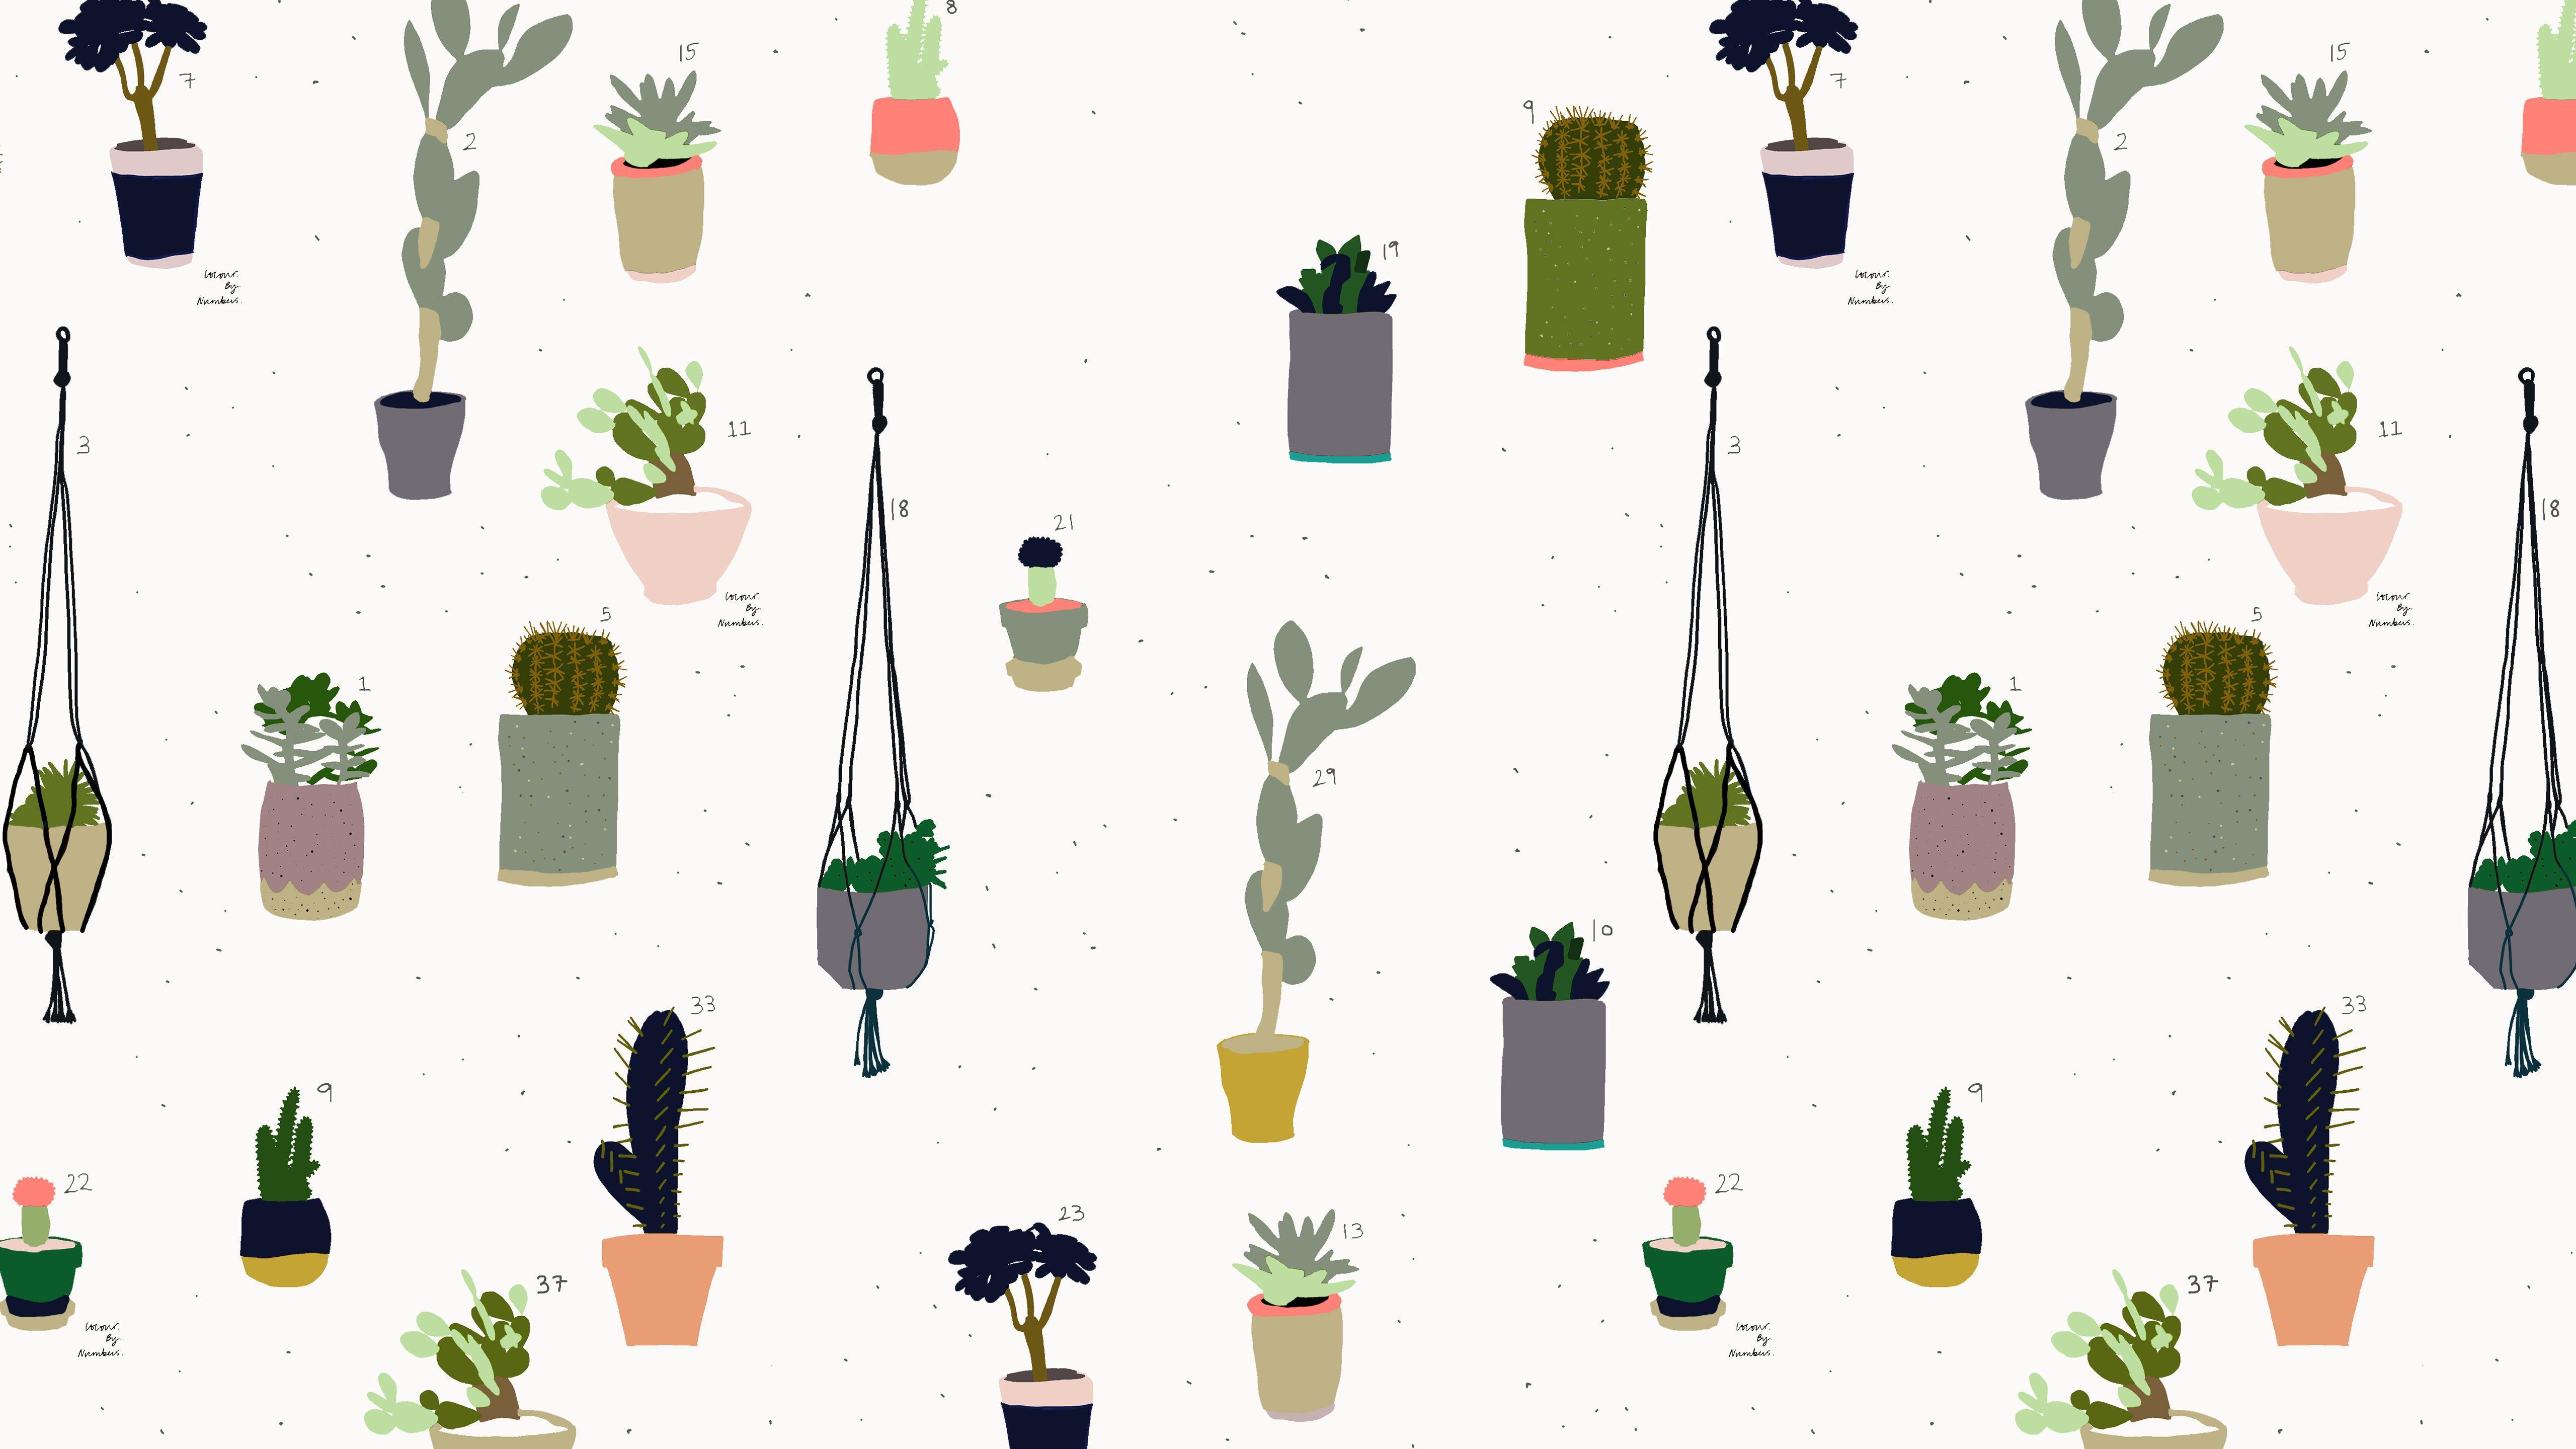 Cactus Wallpapers Top Free Cactus Backgrounds Wallpaperaccess